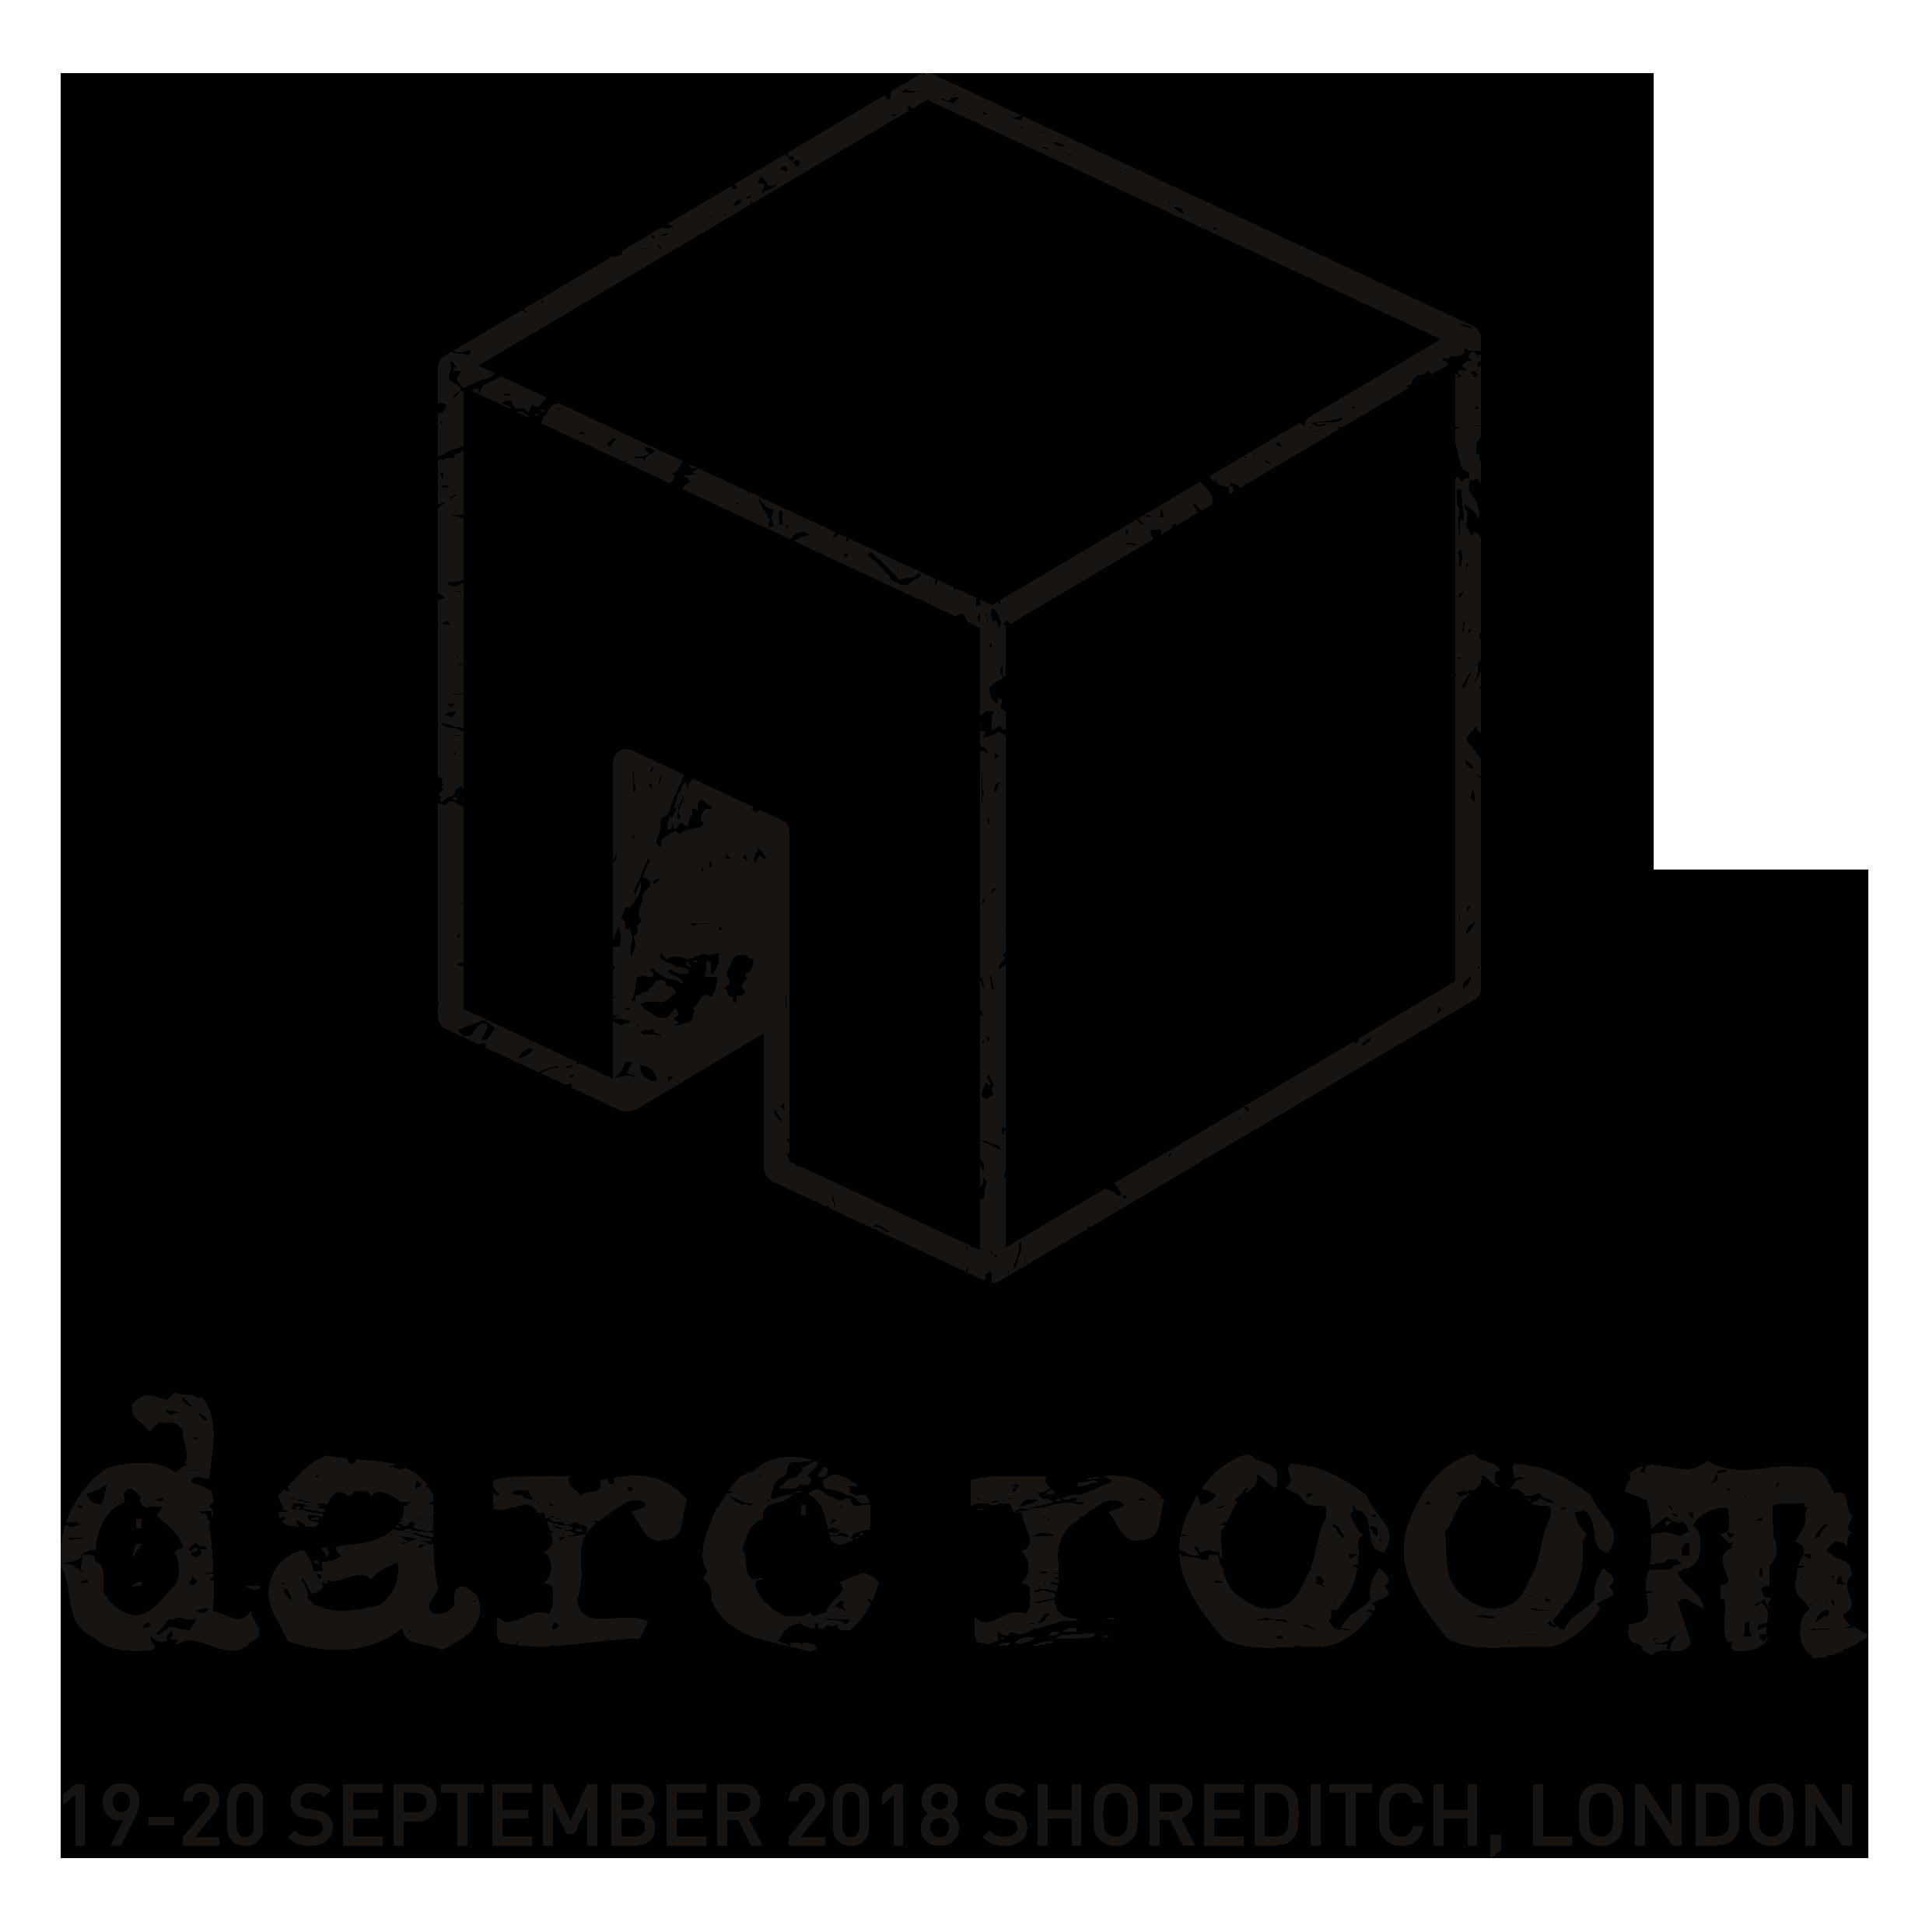 darcroom